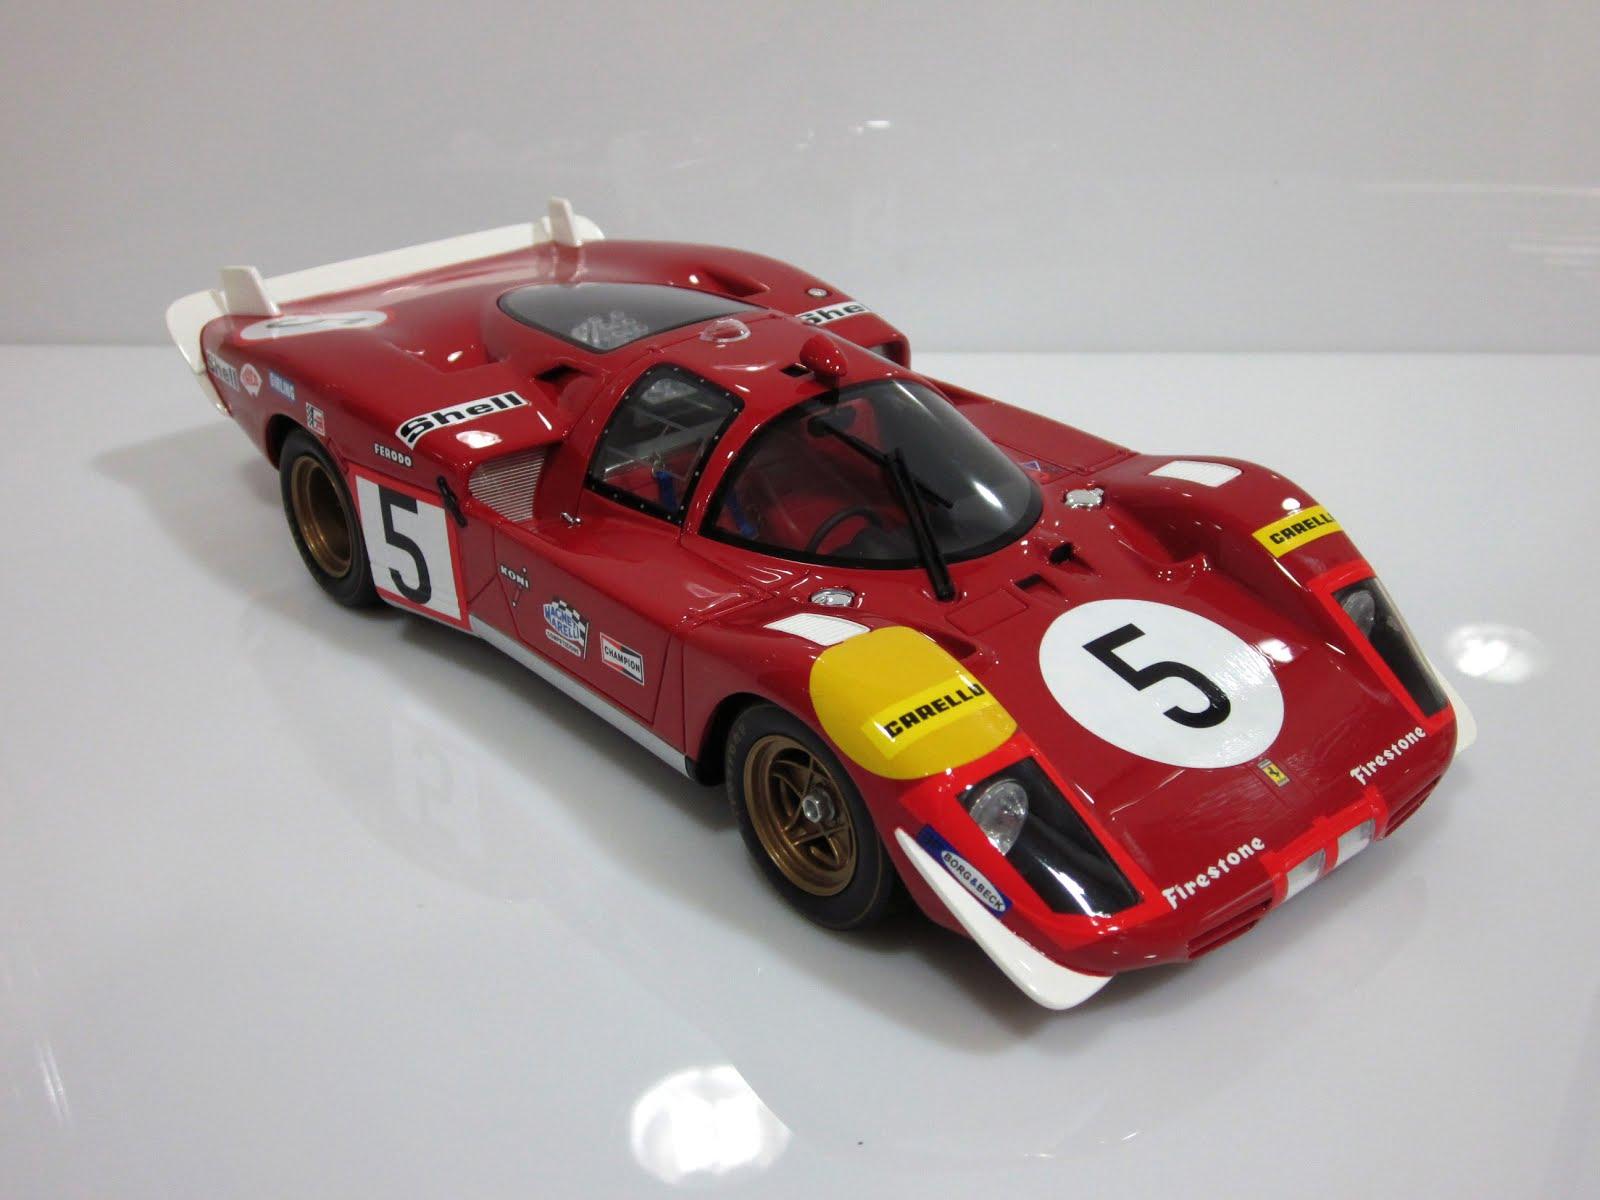 Ferrari 512 S Coda Lunga #5 J. Ickx / P. Schetty - 24 Horas de Le Mans 1970